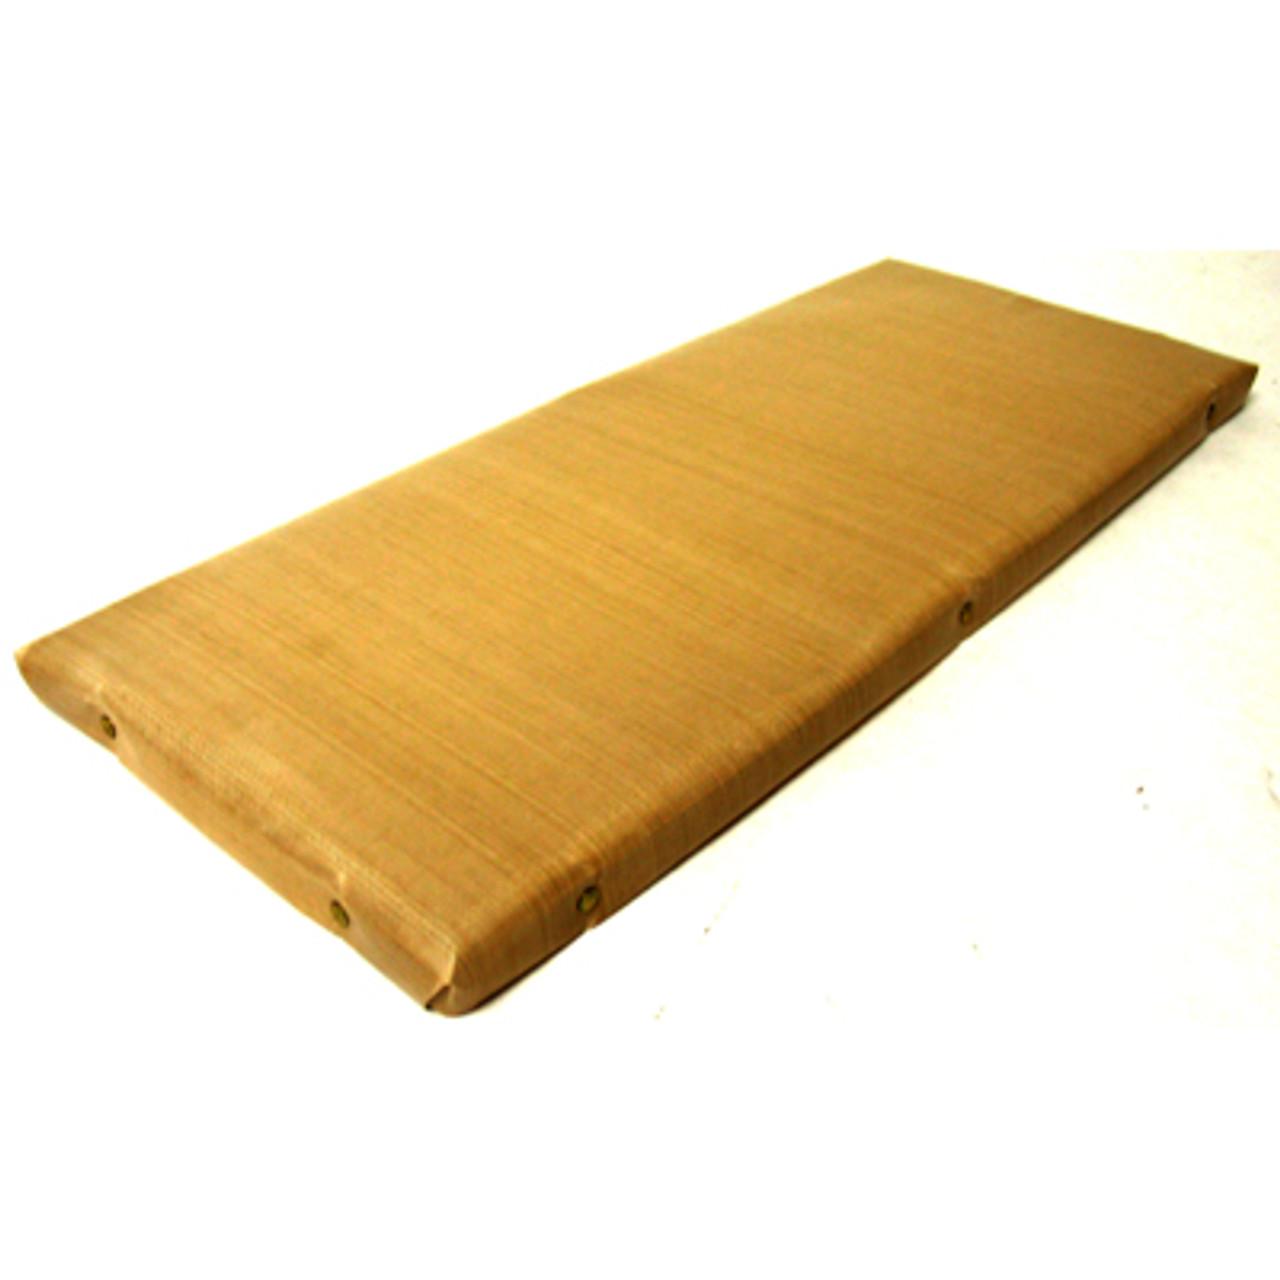 6 x 15 Replacement Teflon Pad - Heat Seal